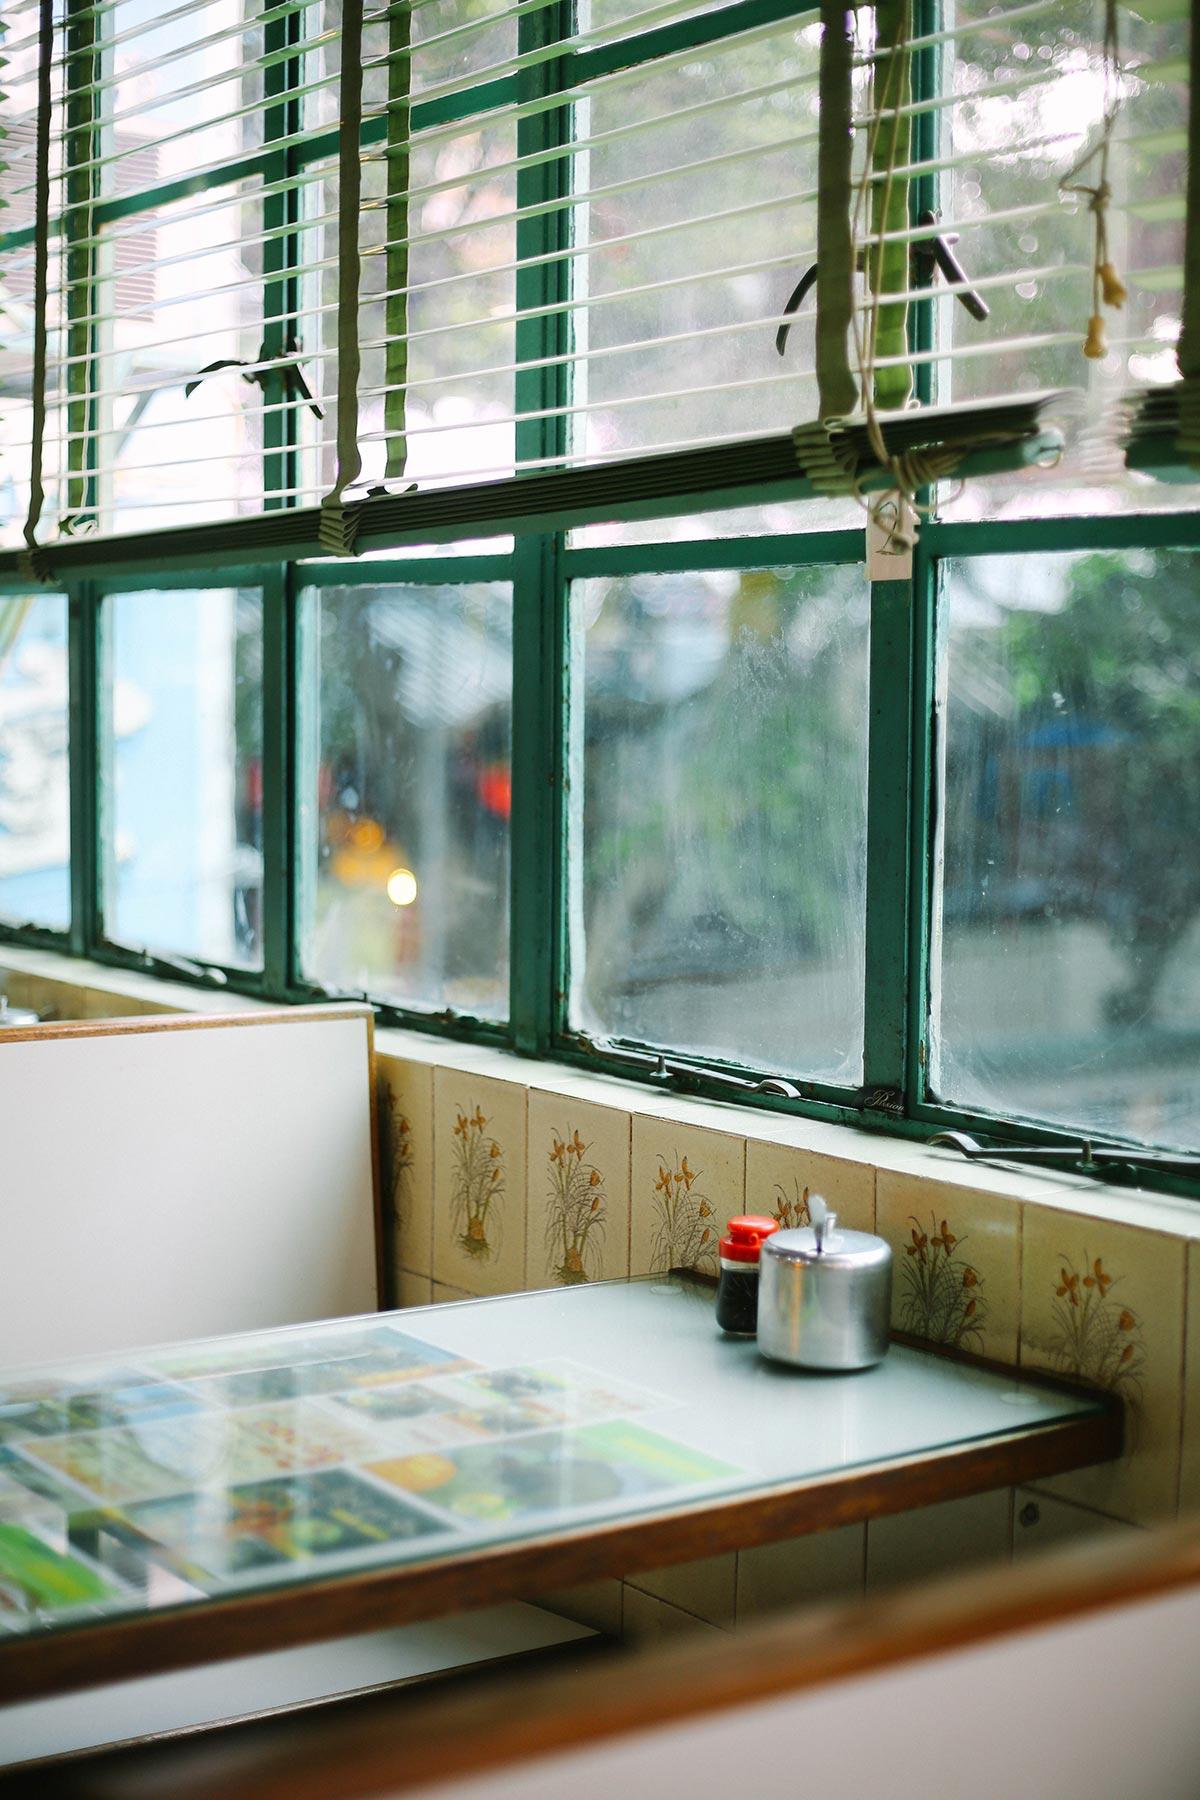 00 ashleigh-leech-hong-kong-mido-cafe-1.jpg